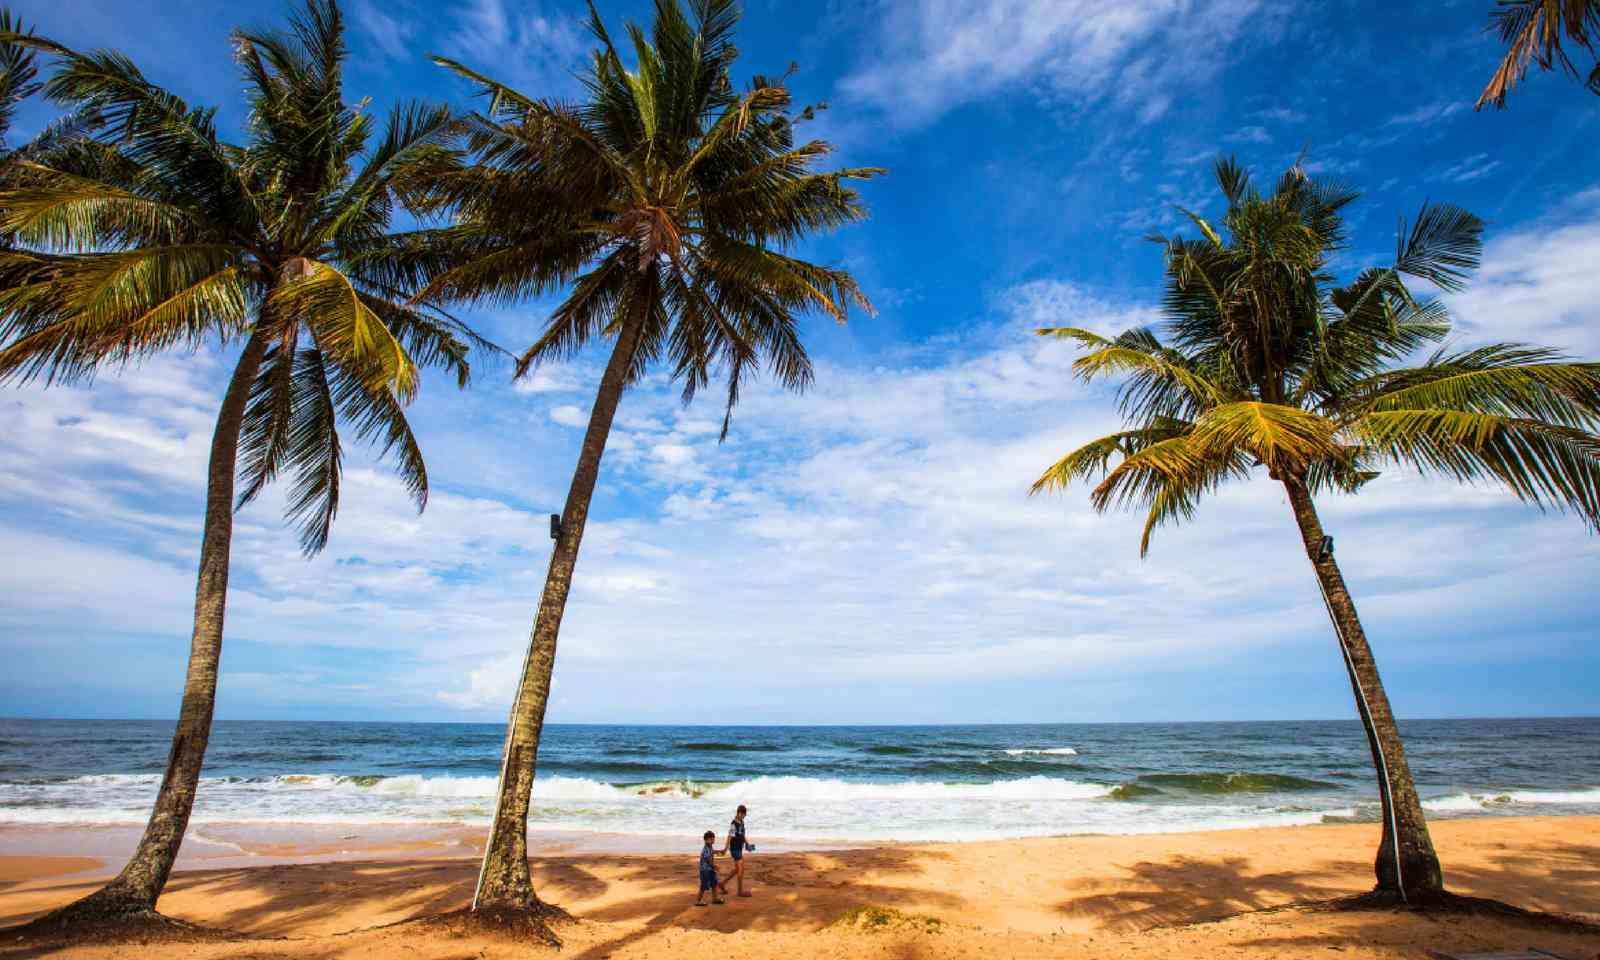 Phu Quoc, Vietnam (Shutterstock)